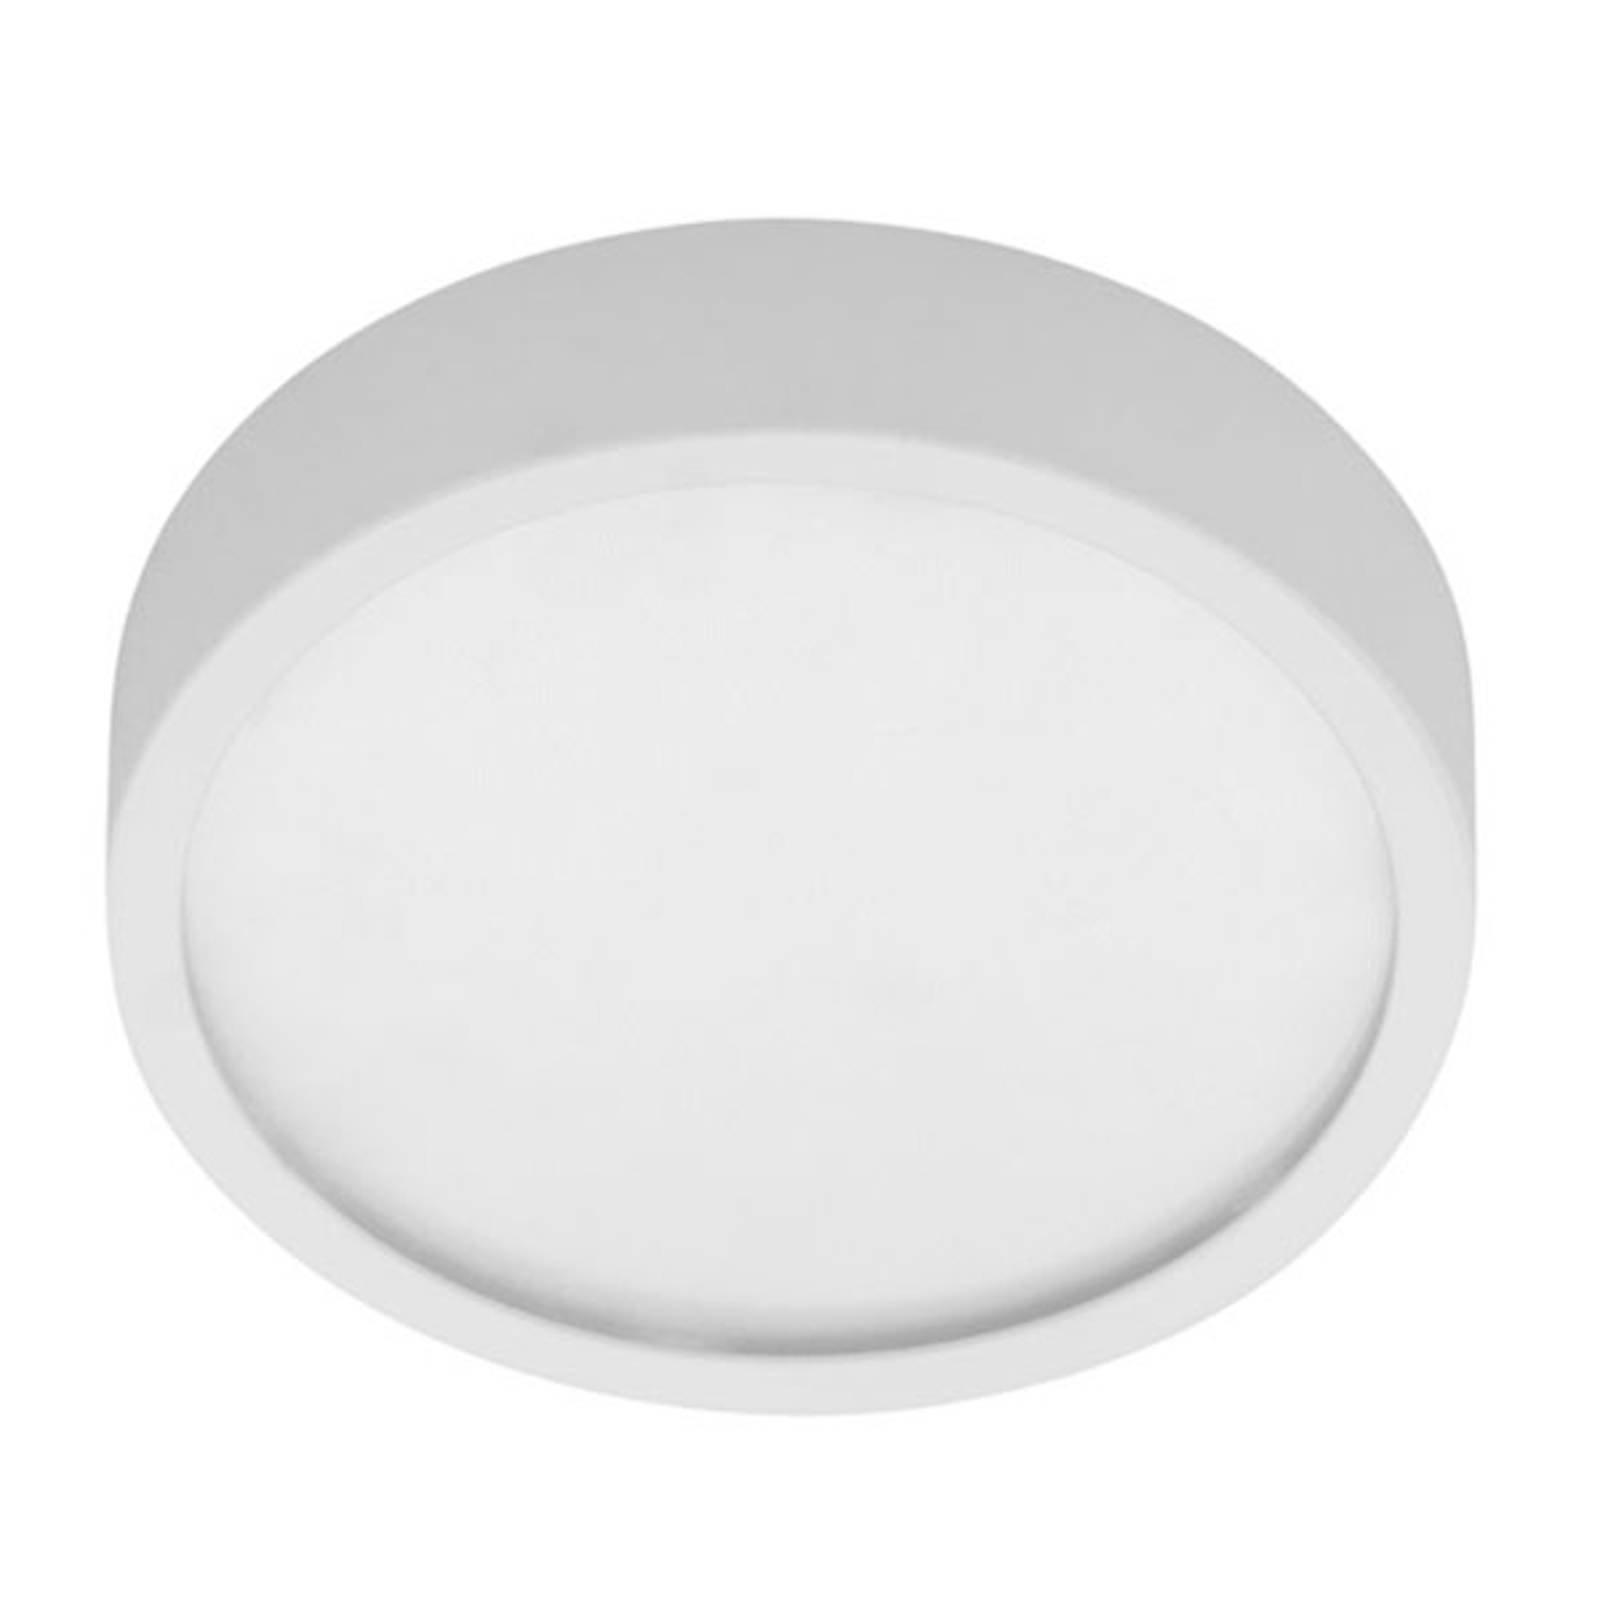 BAP-egnet LED-taklampe, 27W, 4 000 K